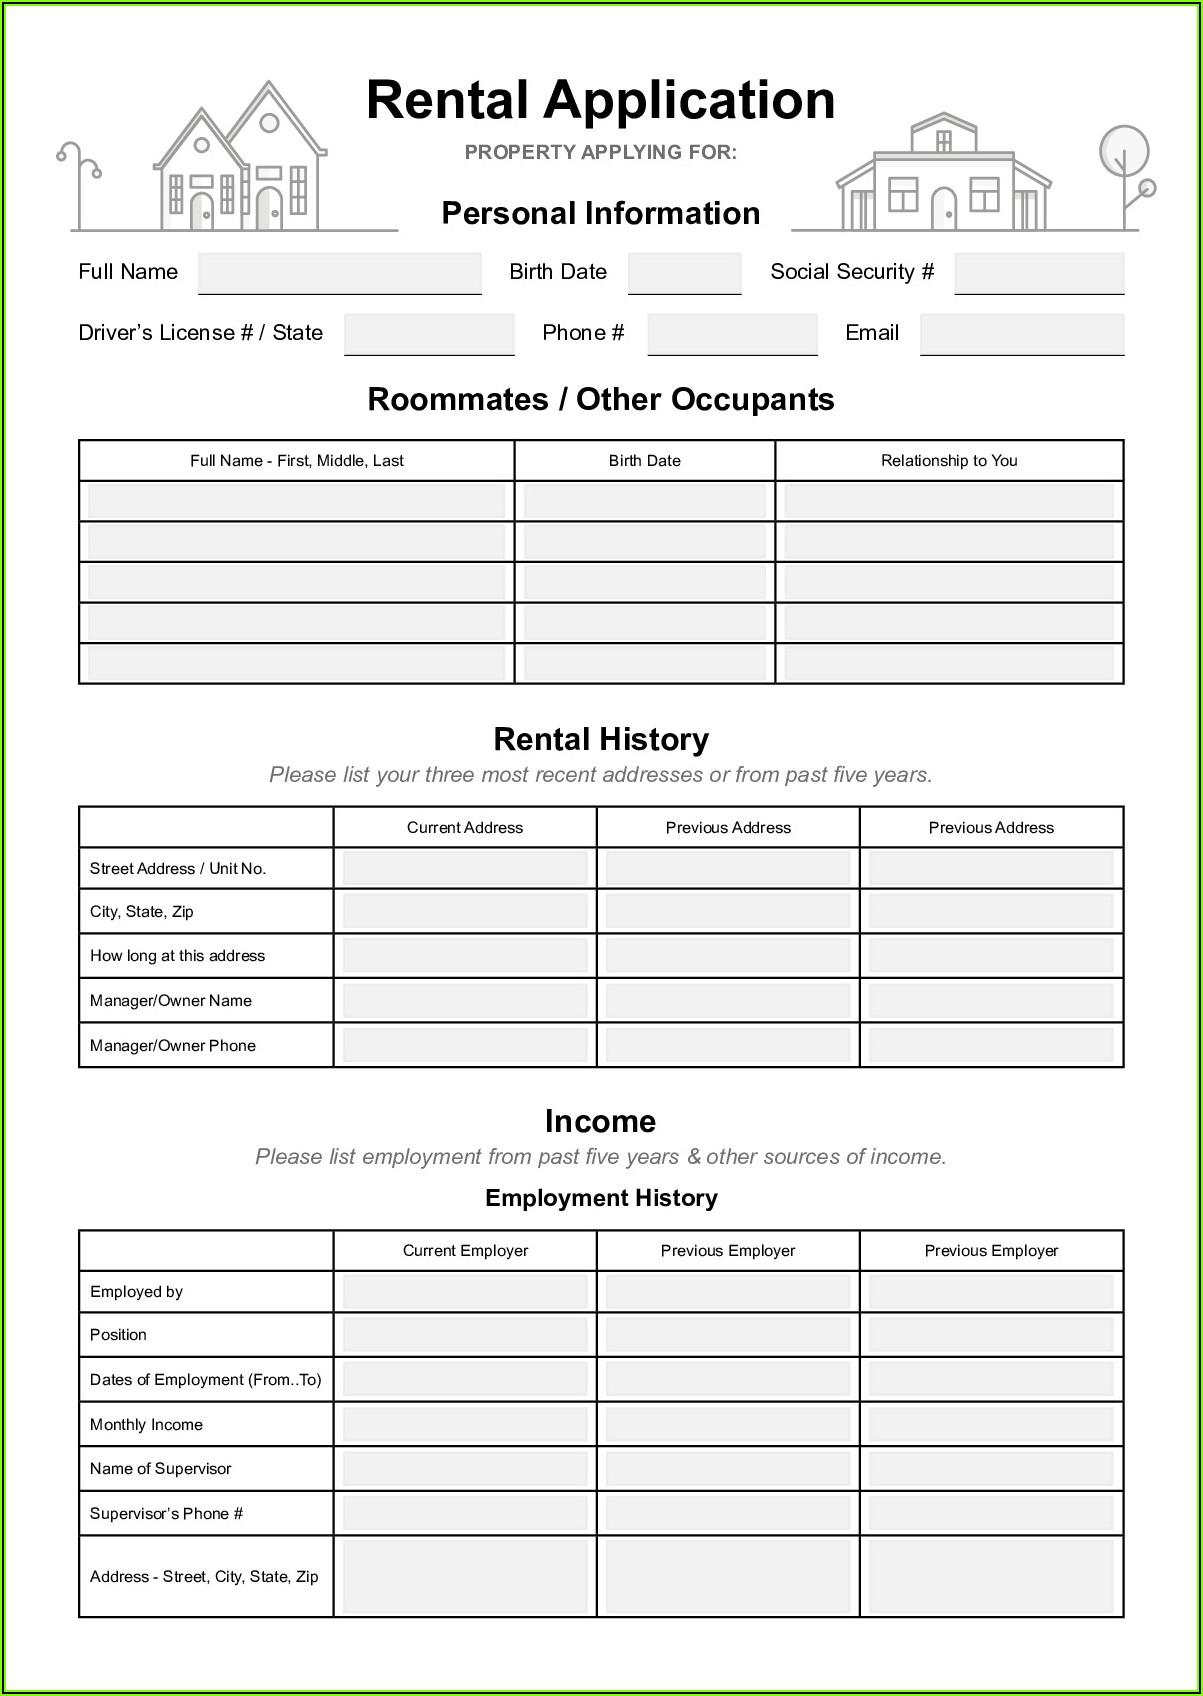 Rental Application Form Virginia Pdf